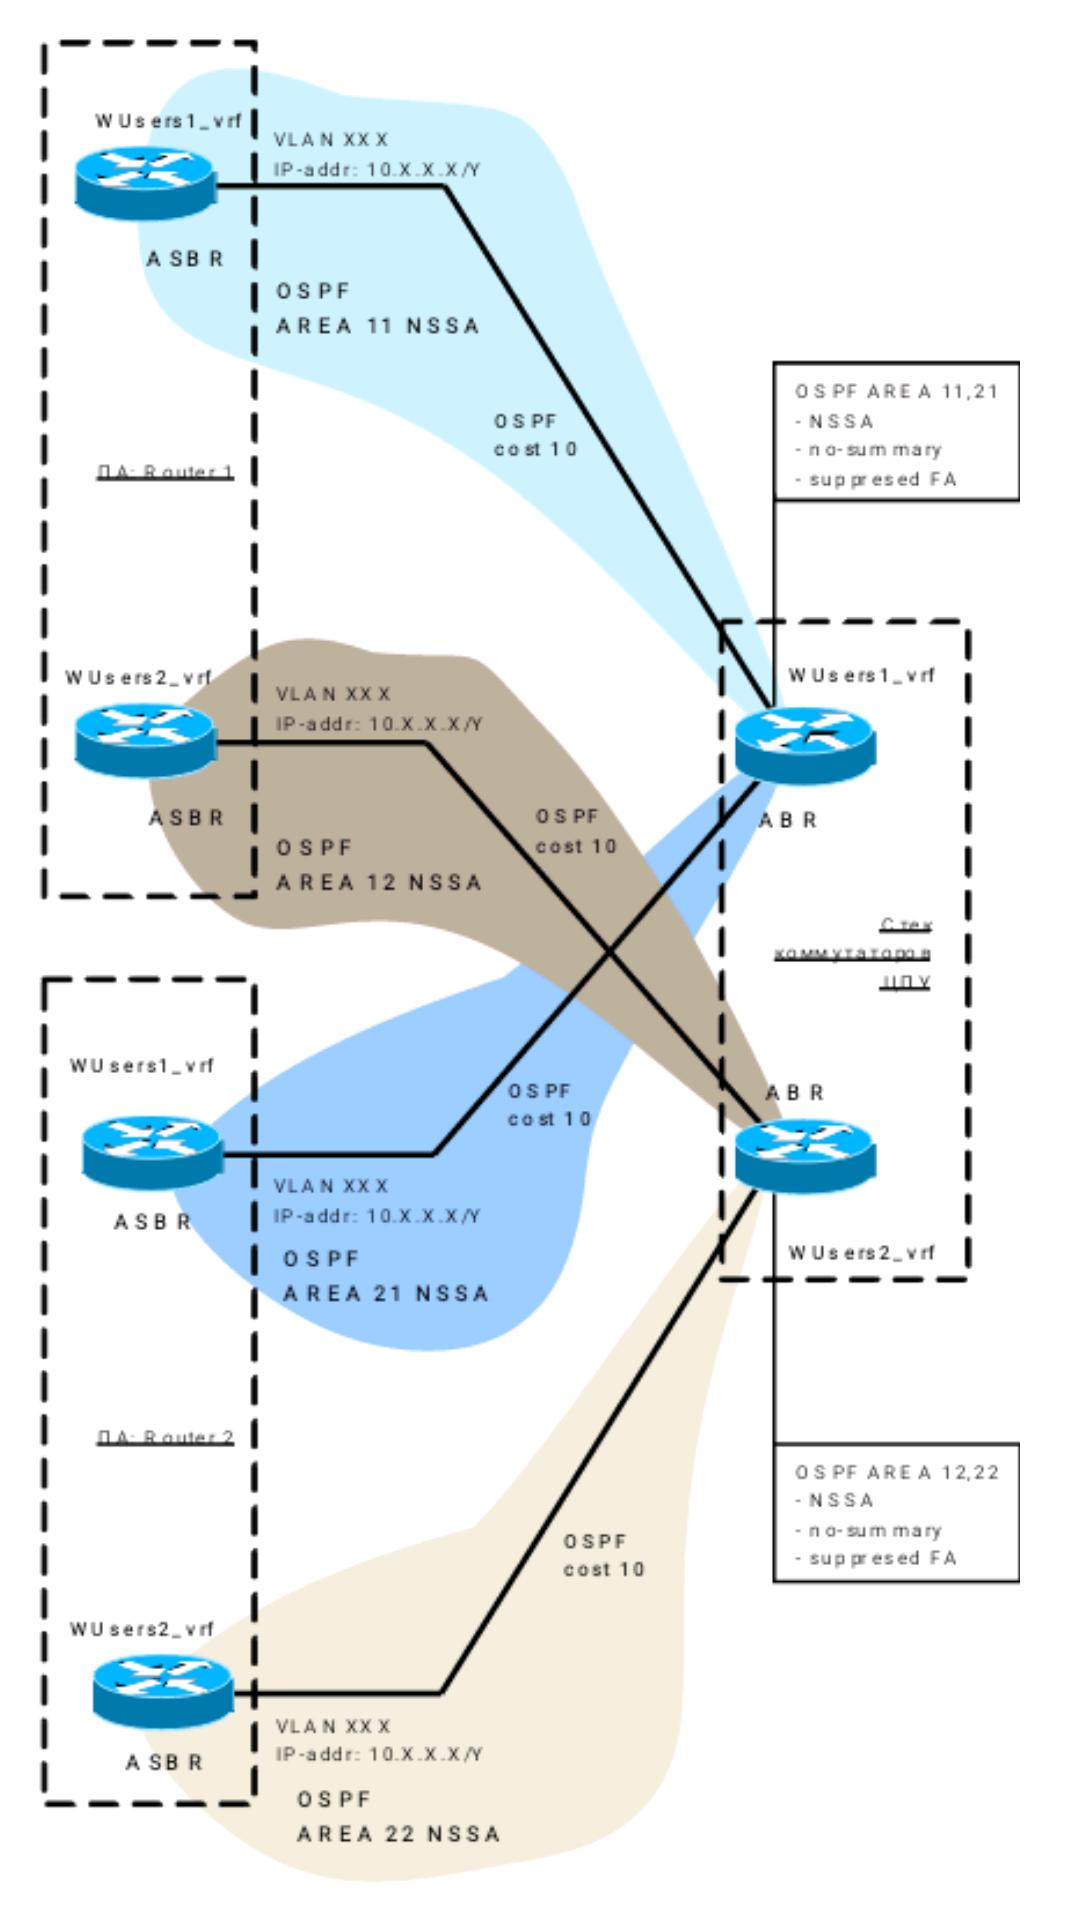 Балансировка трафика в IP-сетях оператора - 2